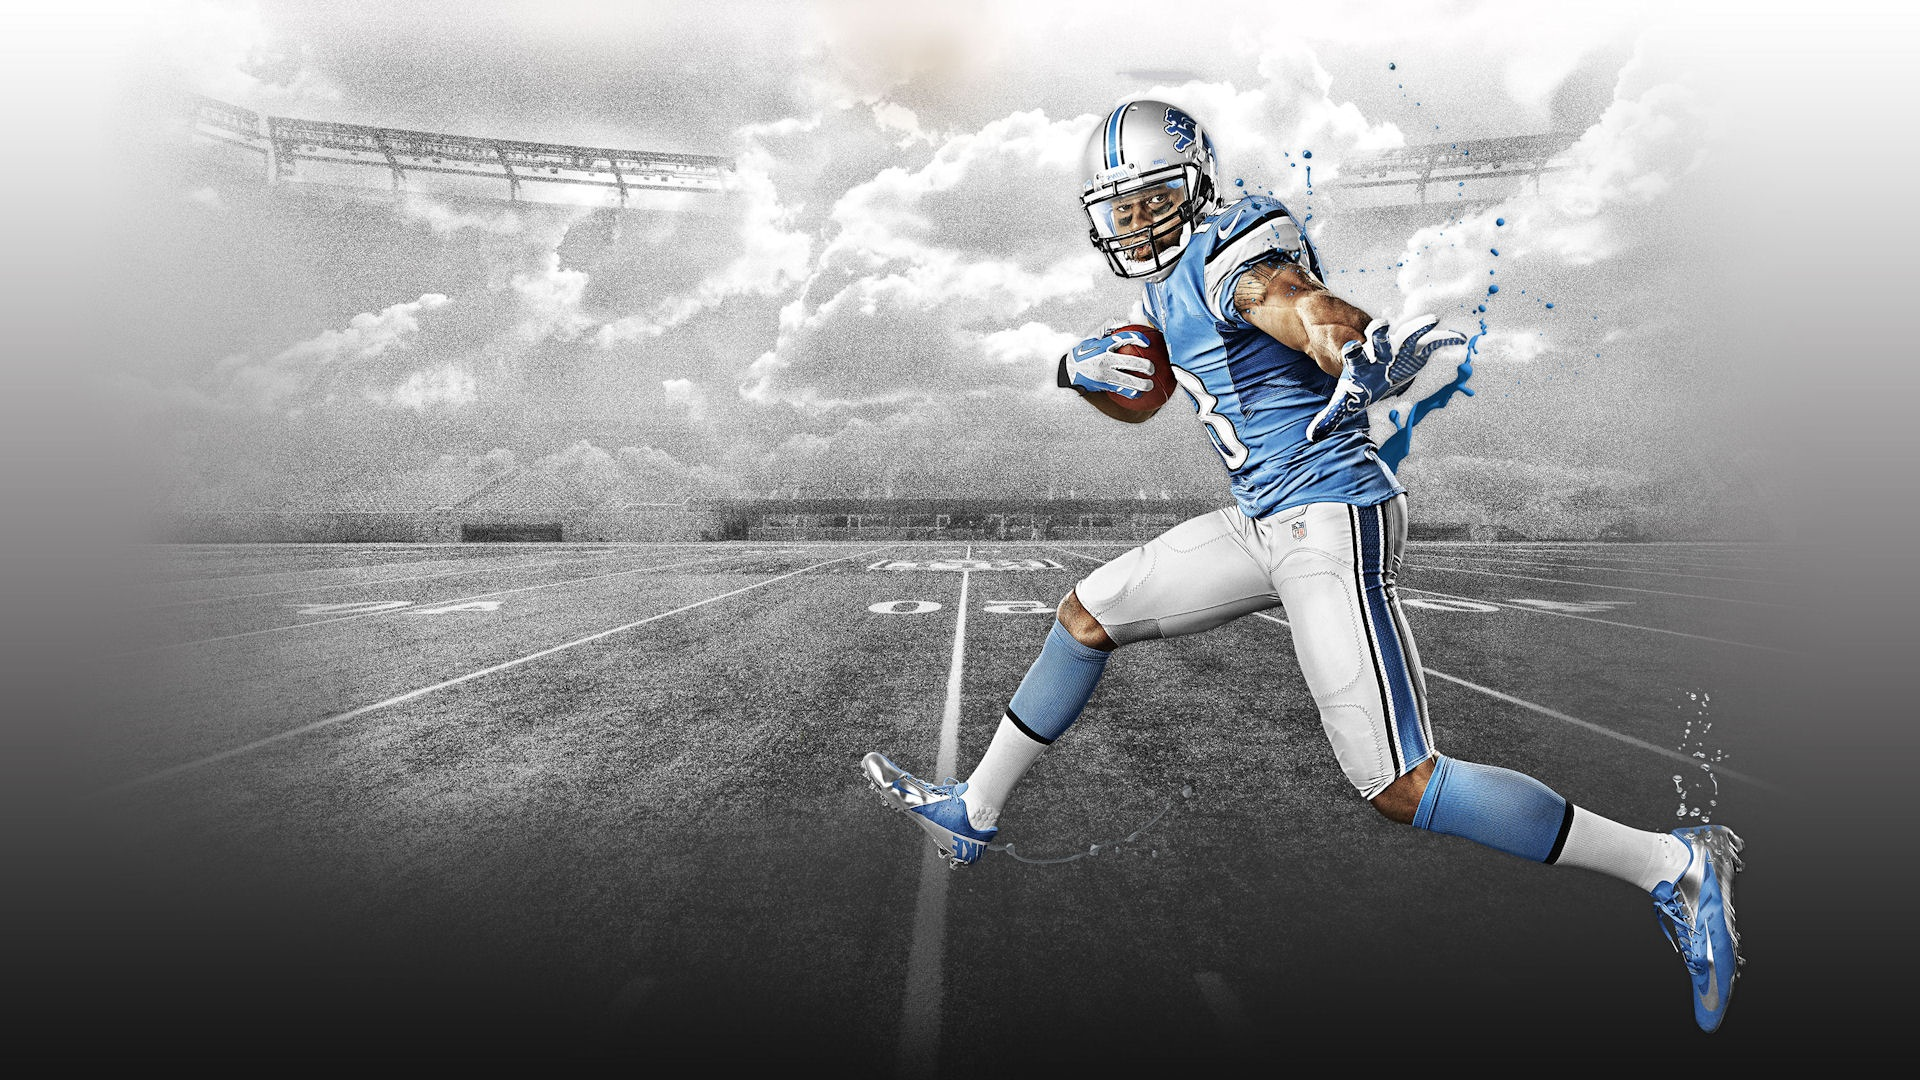 American Football HD Wallpapers Download Desktop Wallpaper 1920x1080